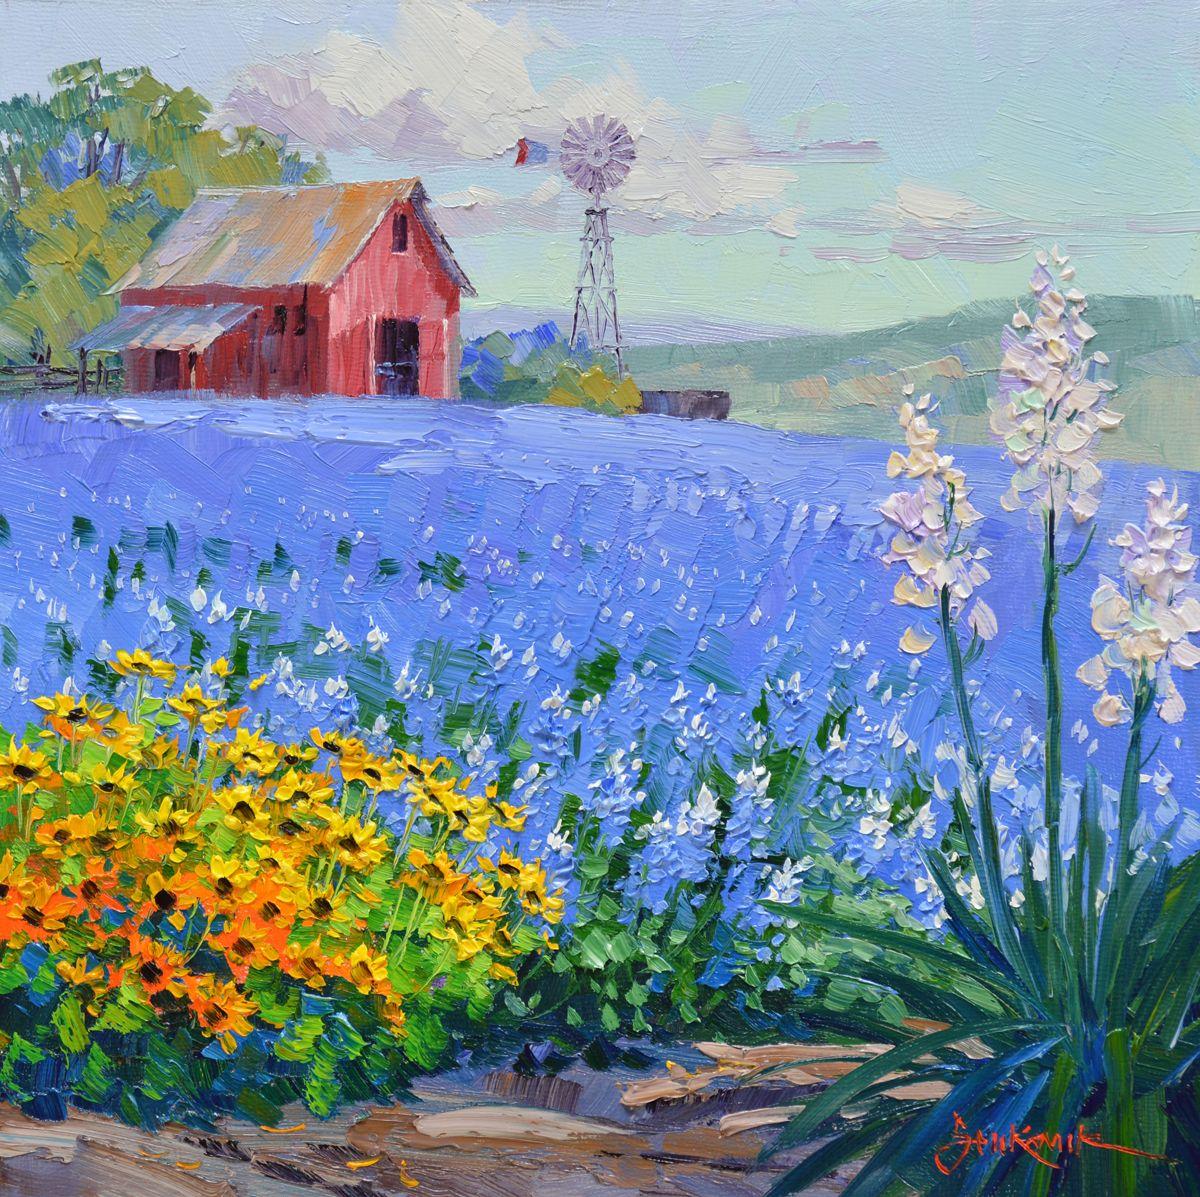 Resultado de imagen de bluebonnet paintings | Casas | Pinterest ...